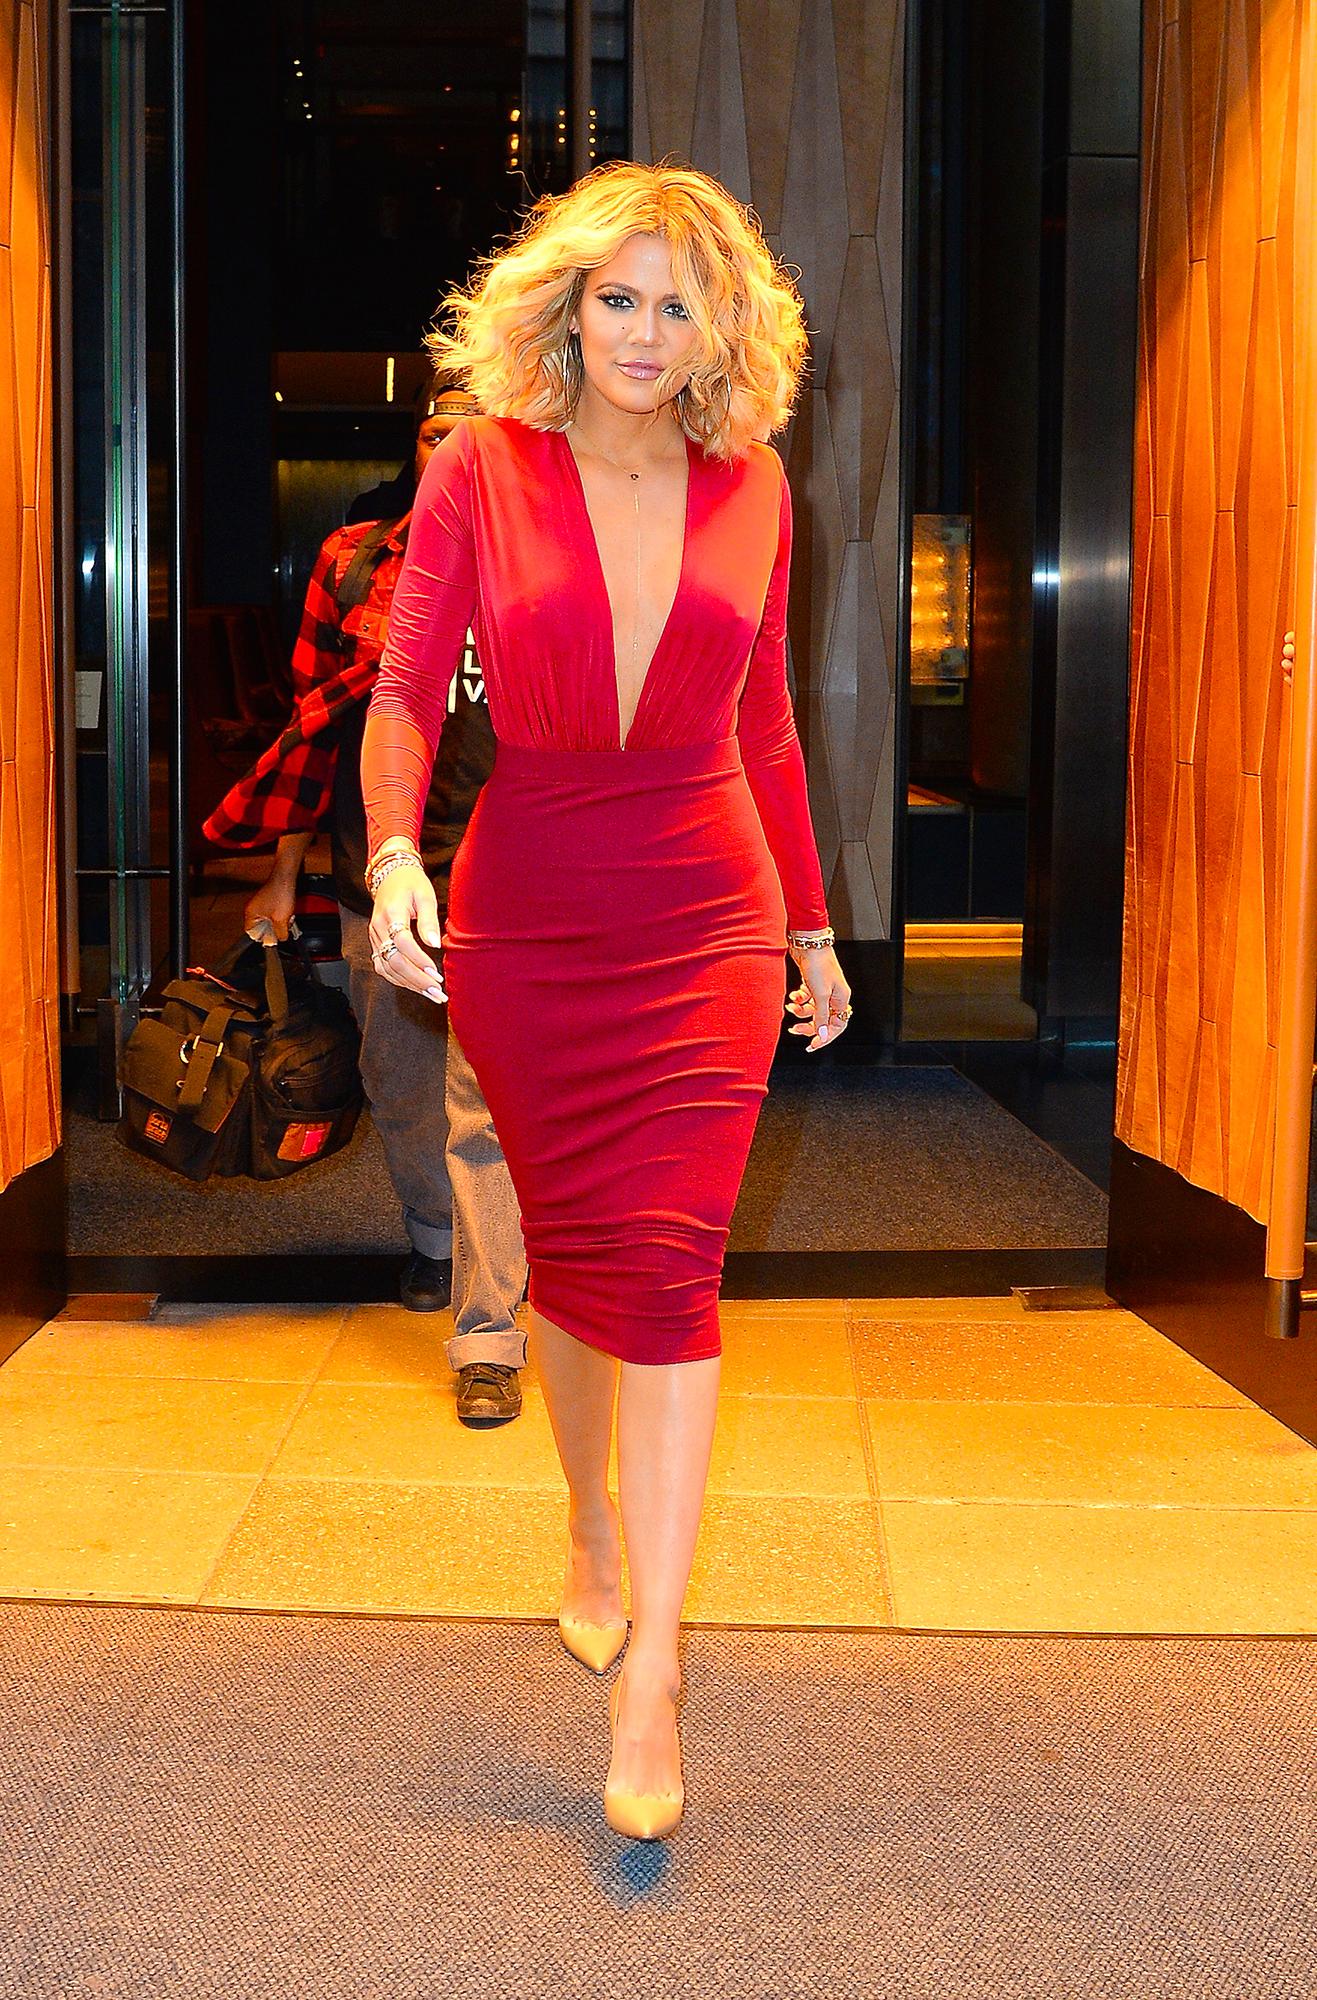 Khloe Kardashian - Khloé sizzled in a plunging, red-hot dress while walking through NYC's SoHo neighborhood on January 15, 2016.